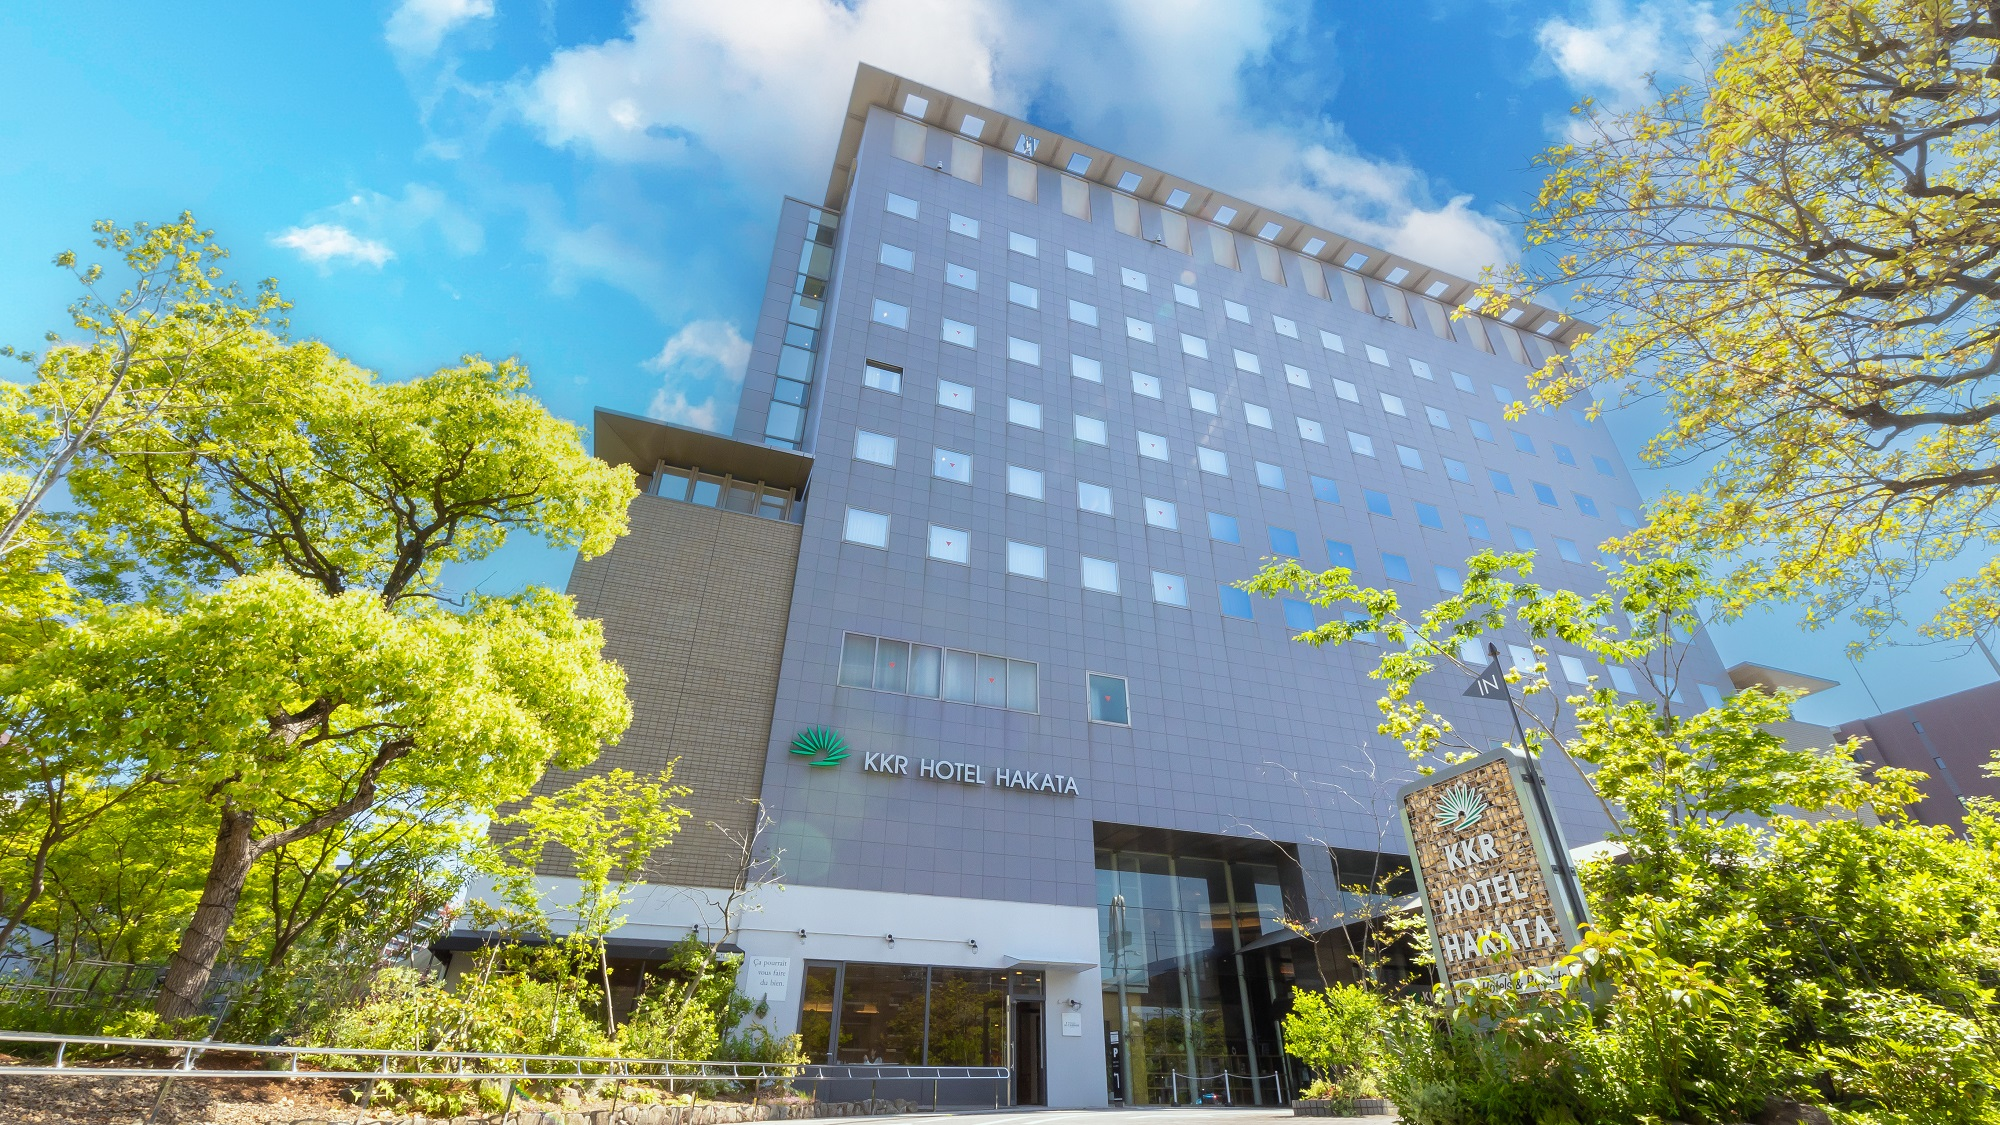 KKRホテル博多(国家公務員共済組合連合会福岡共済会館)...